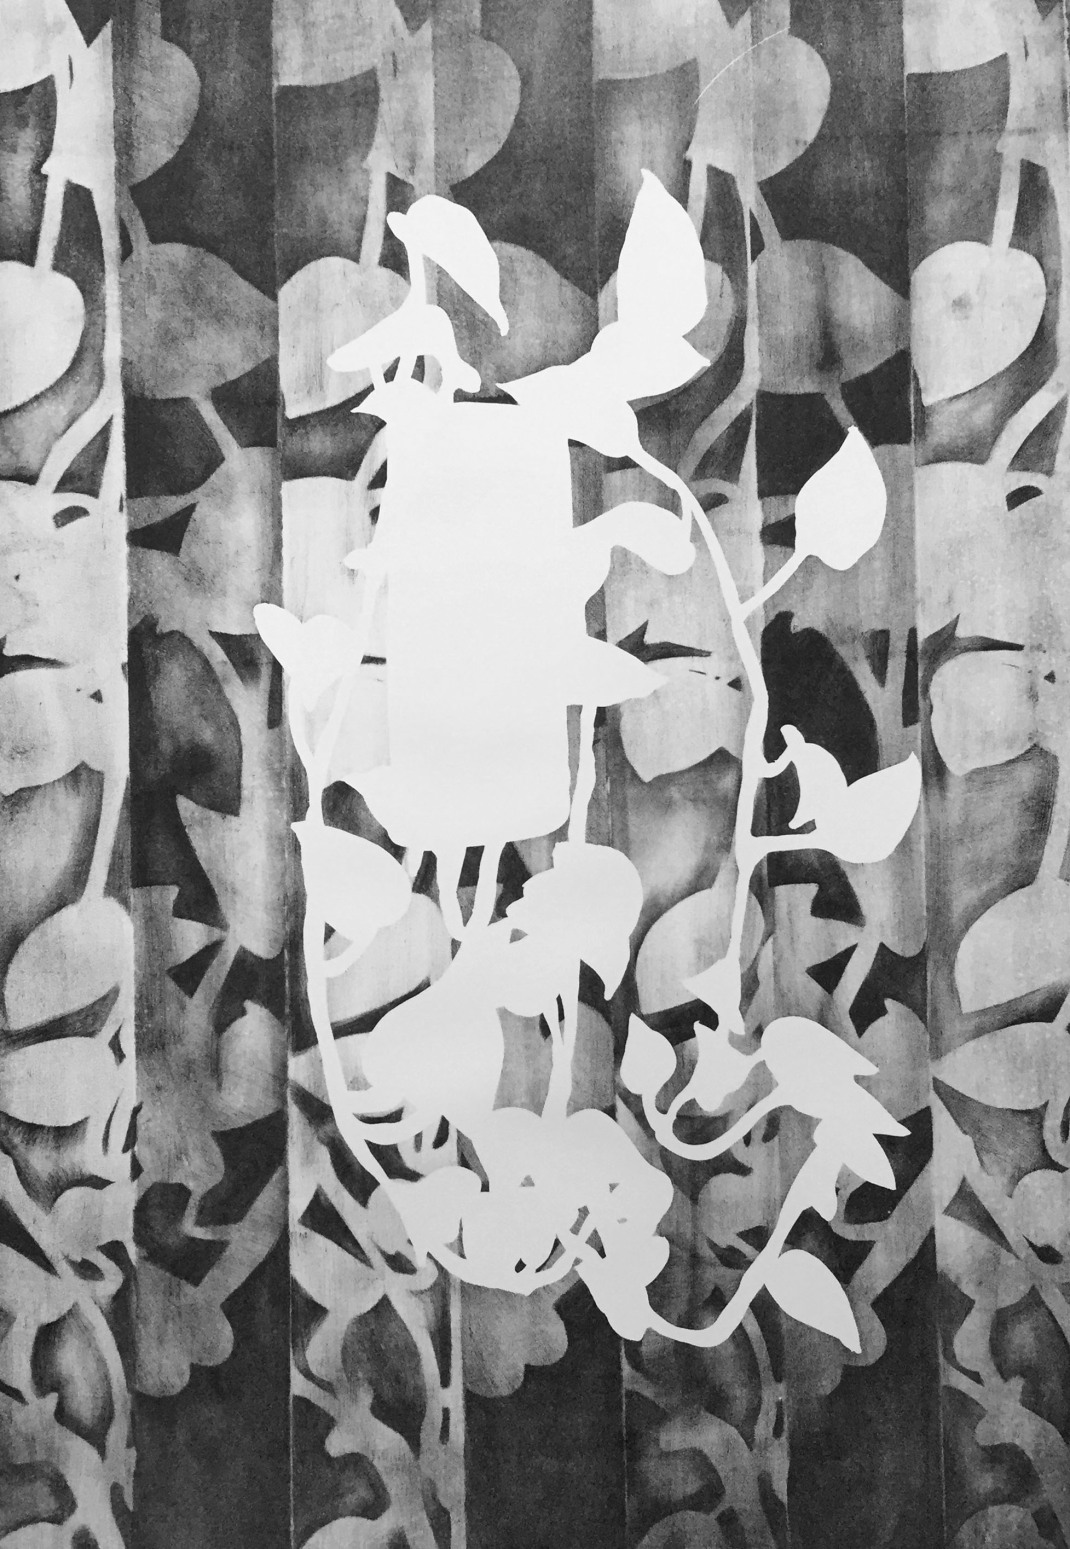 Umbra lithograph